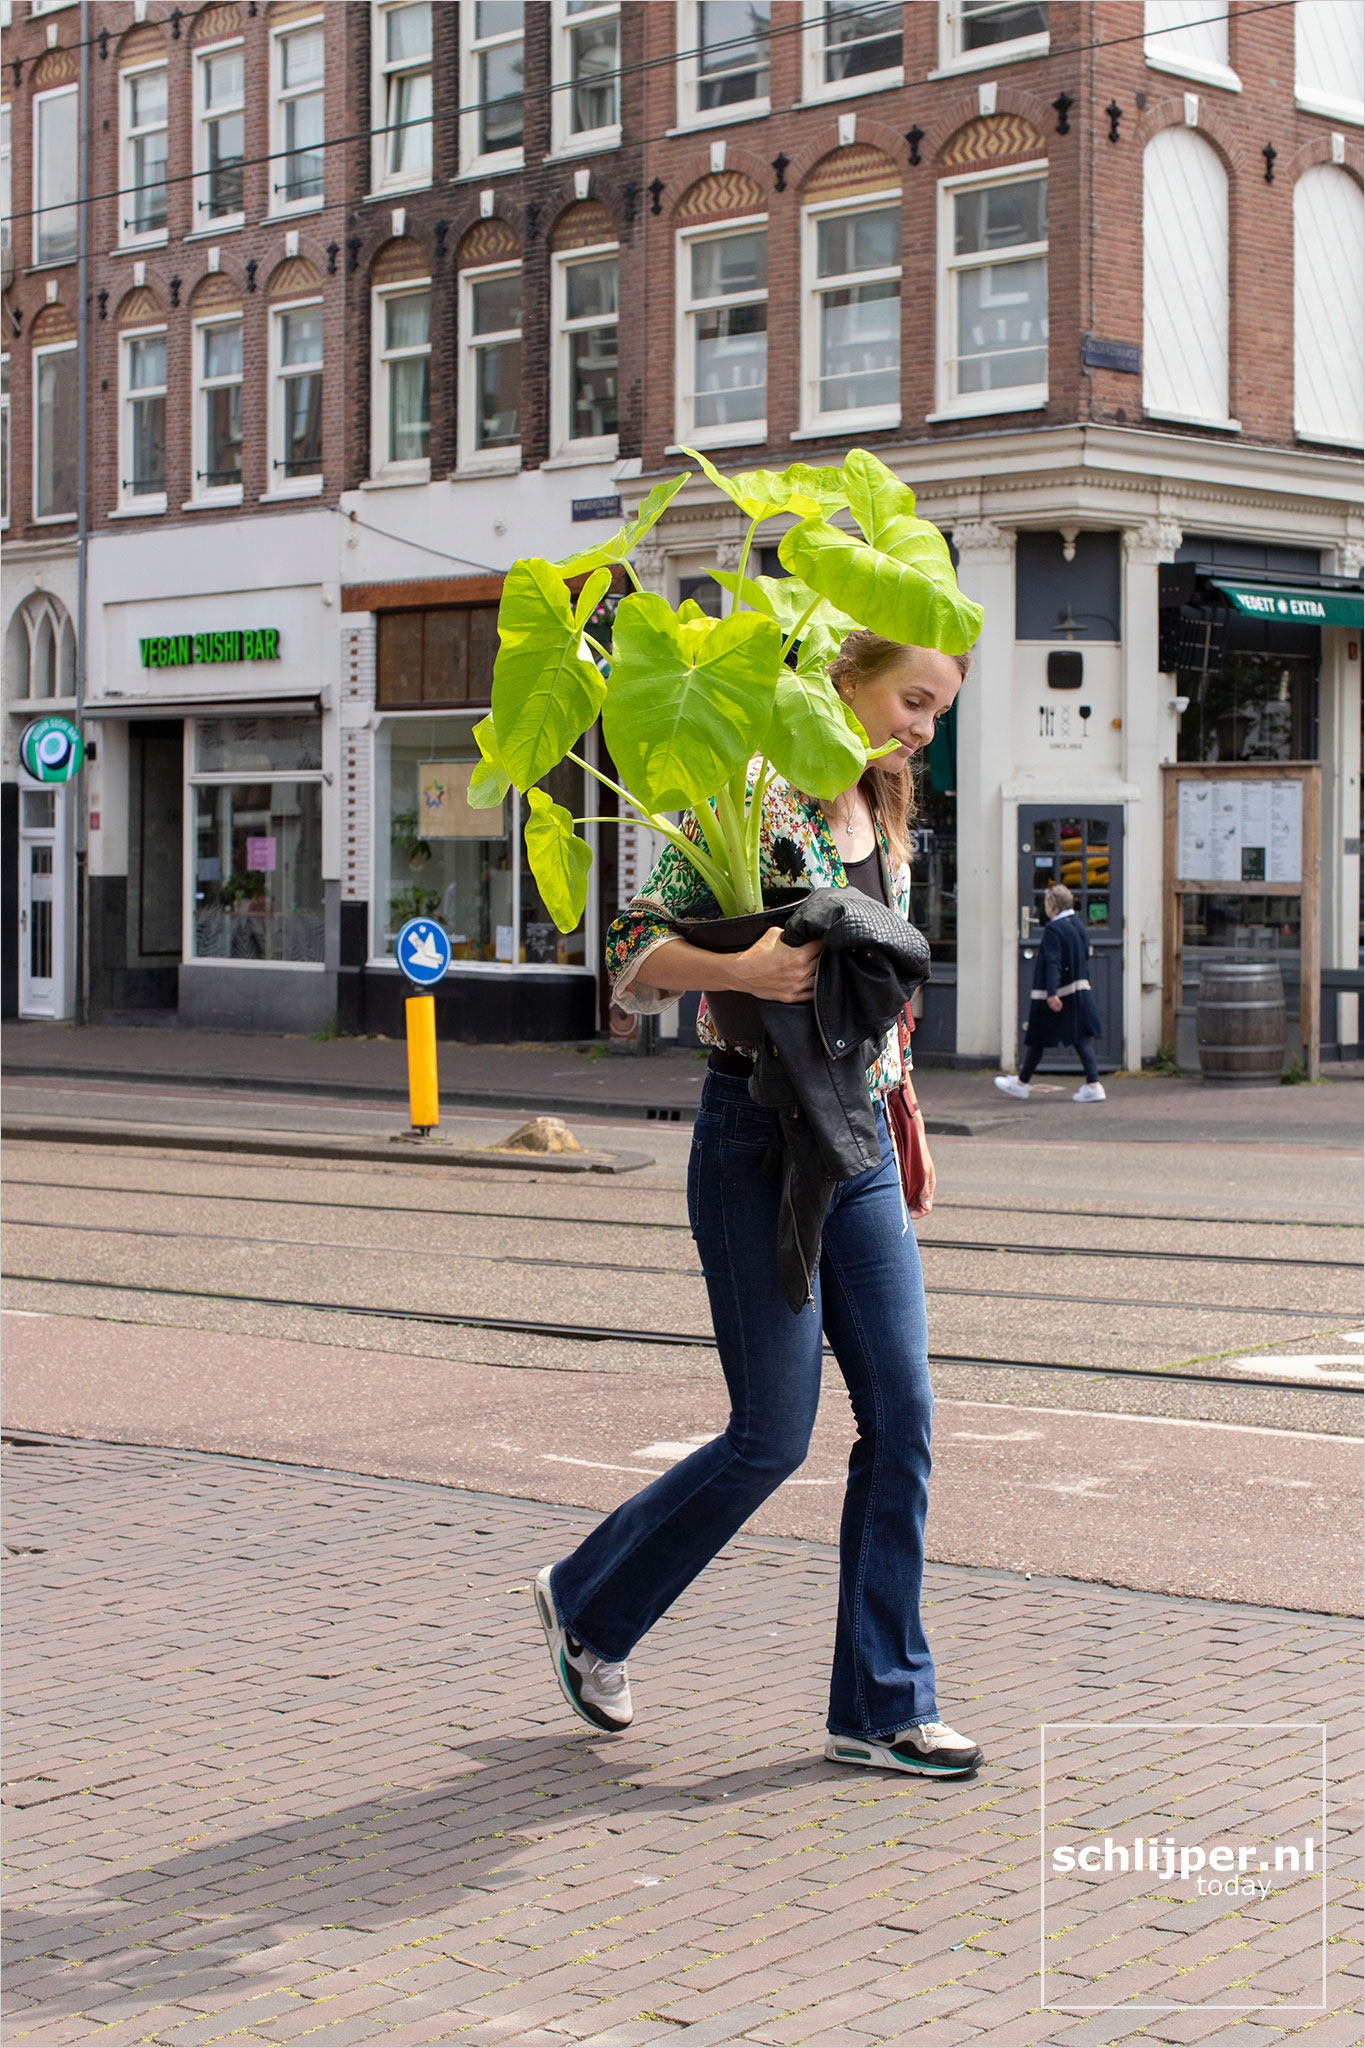 Nederland, Amsterdam, 25 mei 2020